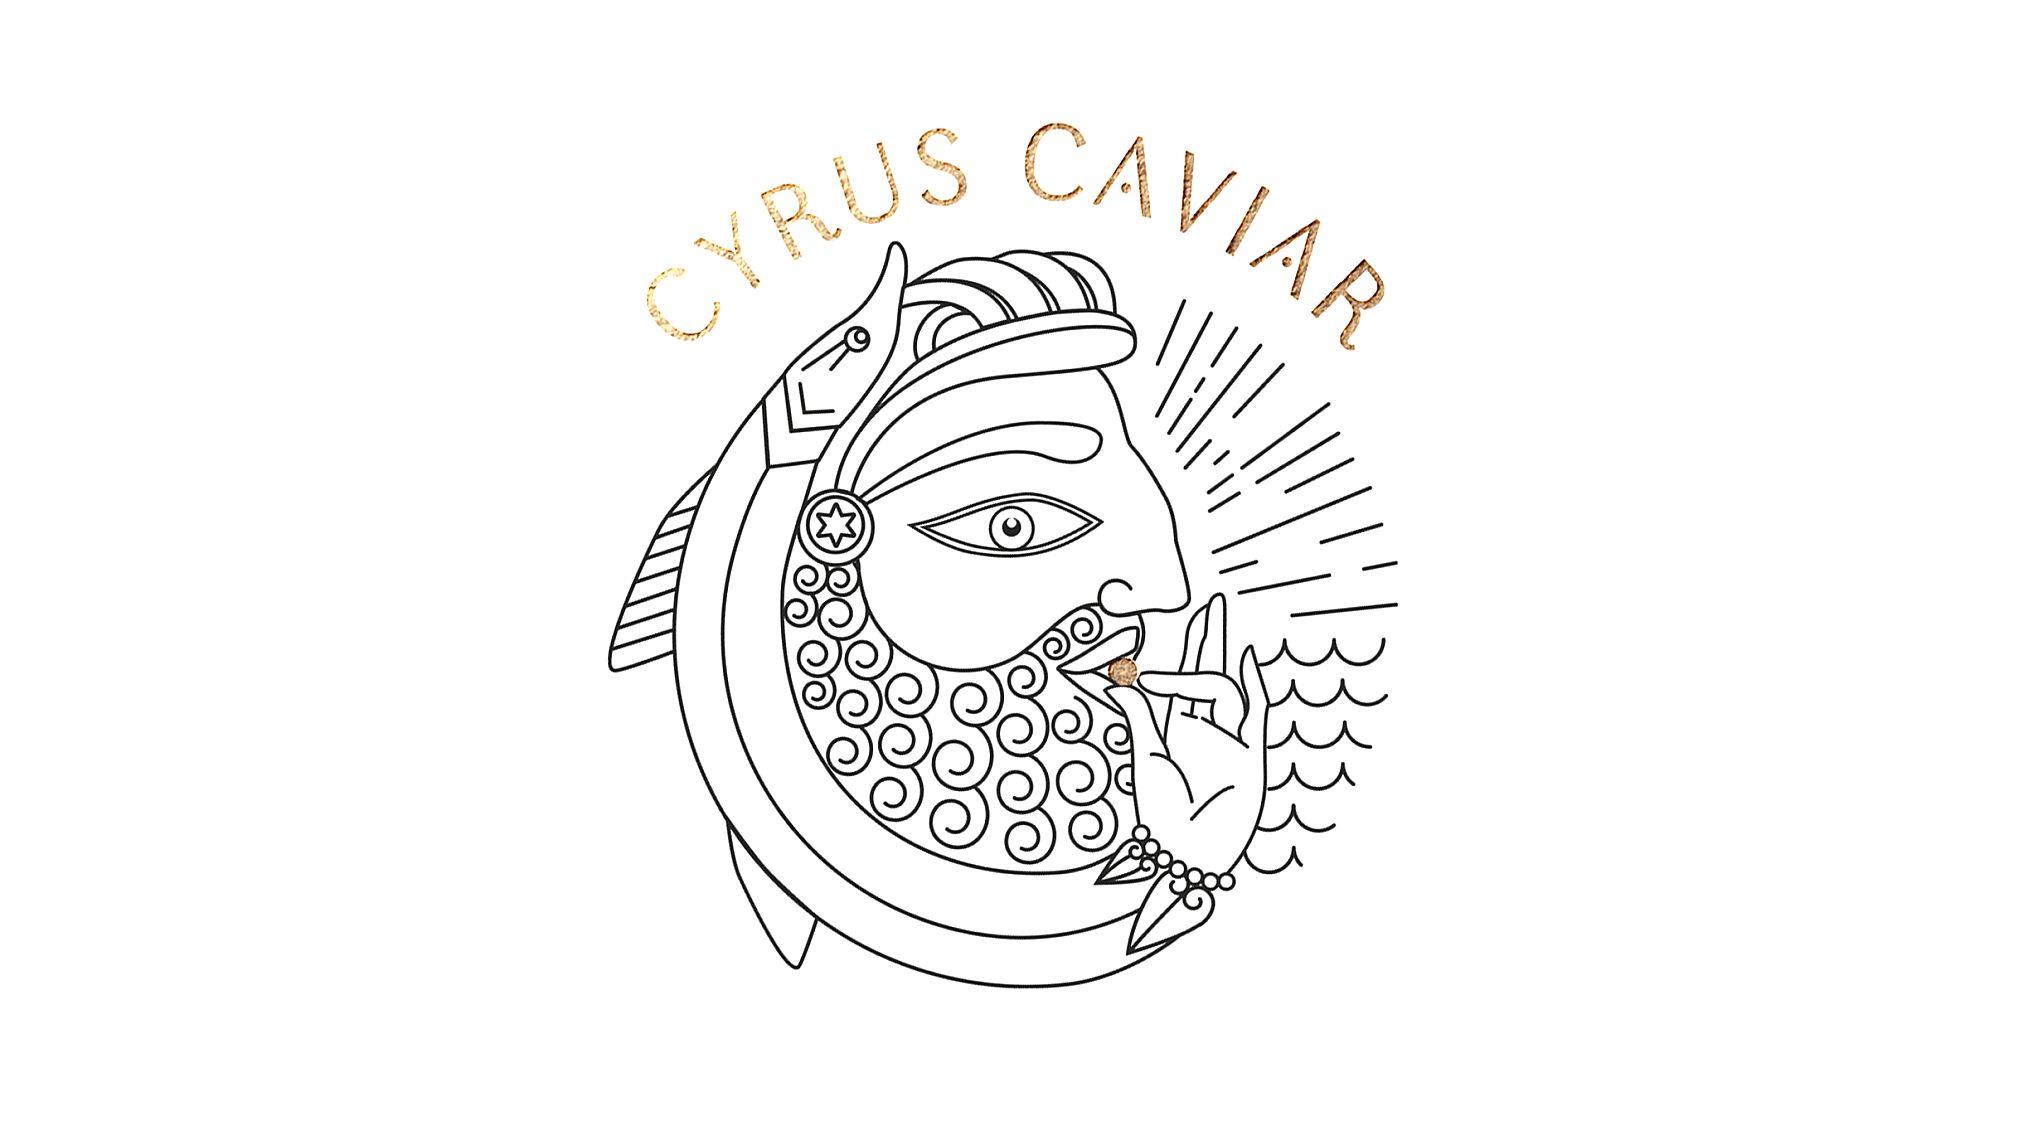 Picnic insolite avec Cyrus Caviar